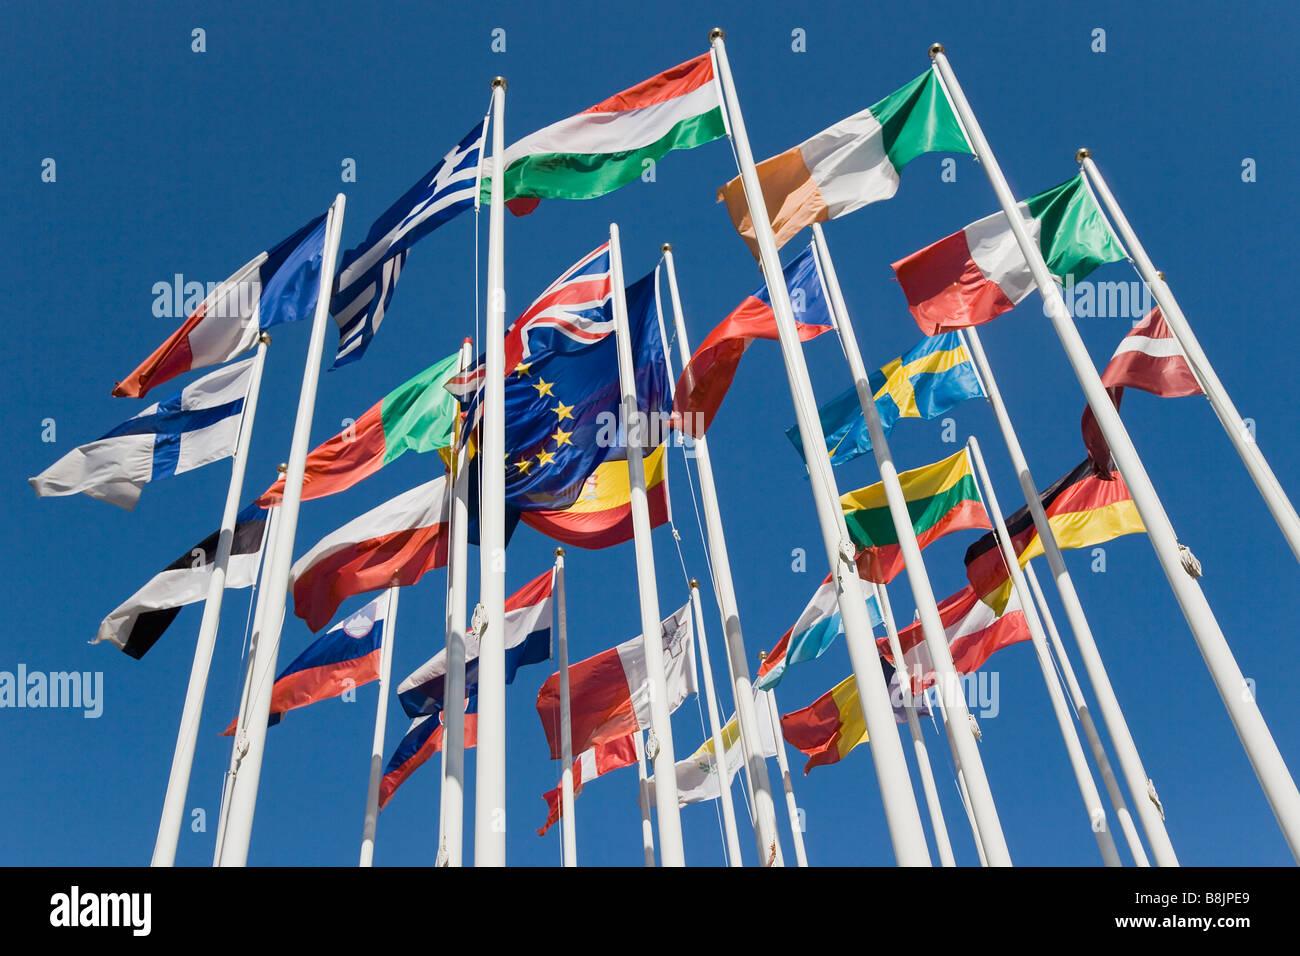 International flags - Stock Image